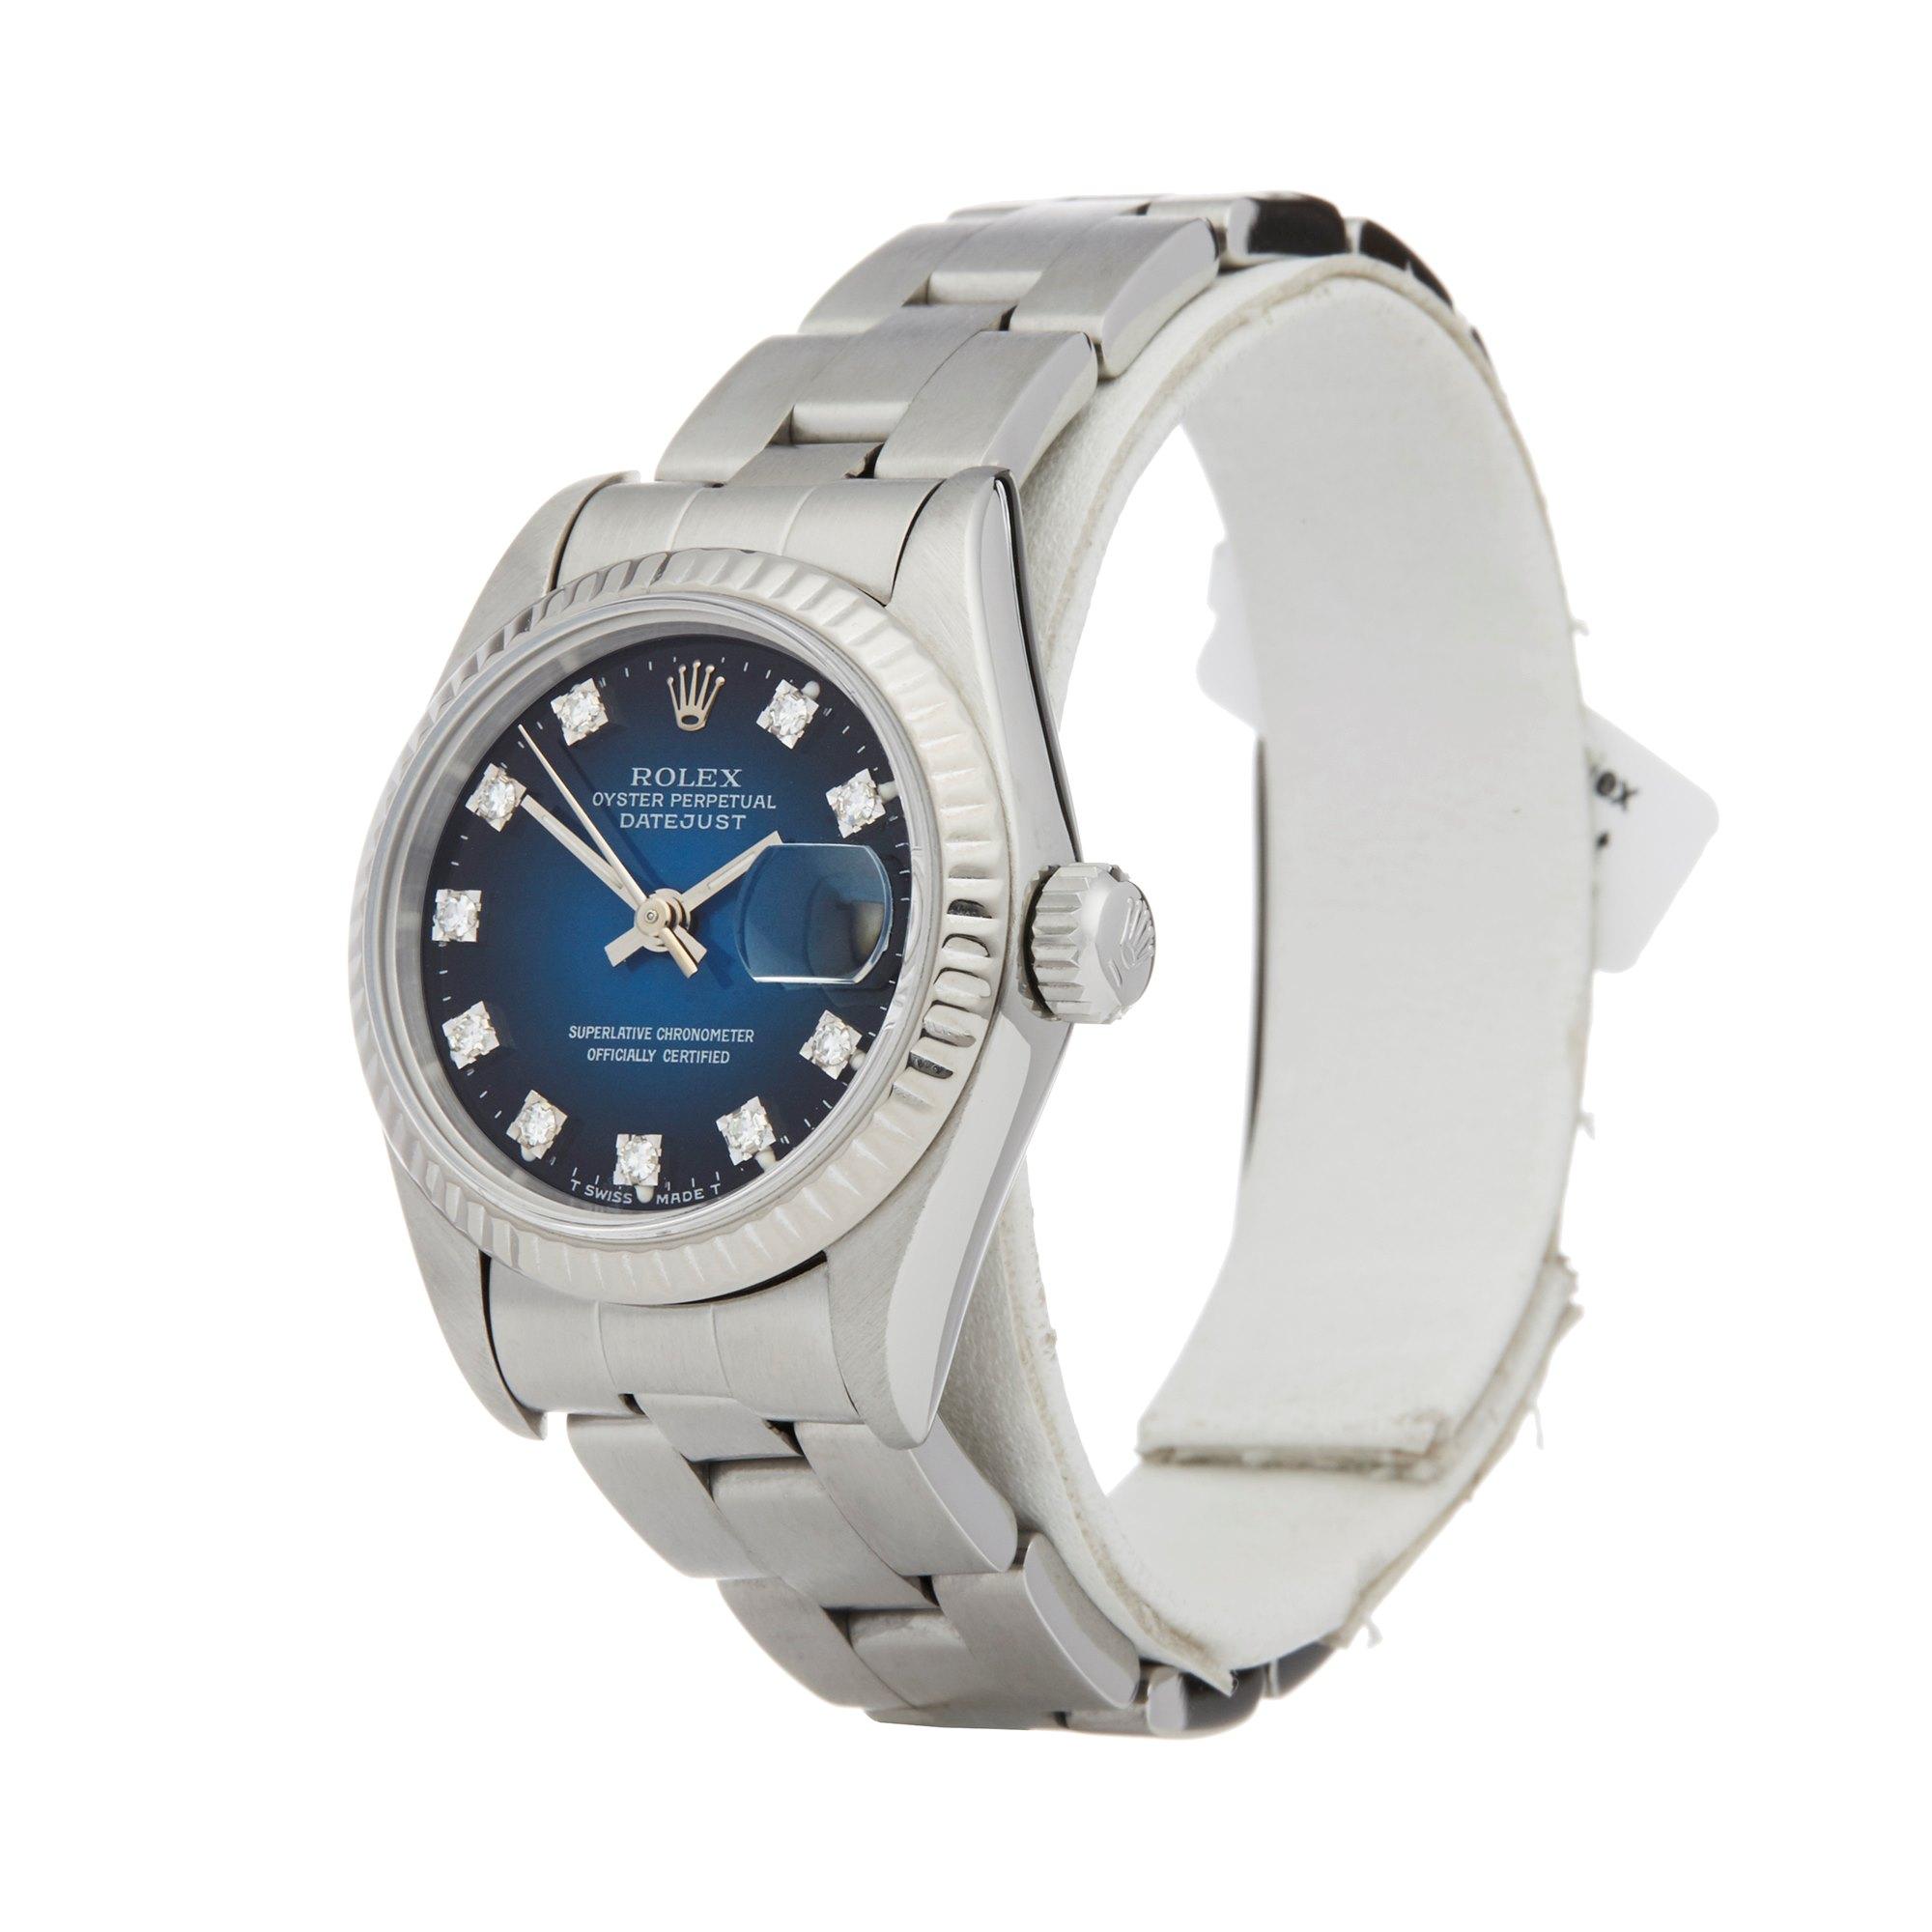 Rolex Datejust 26 Graduated Diamond Stainless Steel 69174